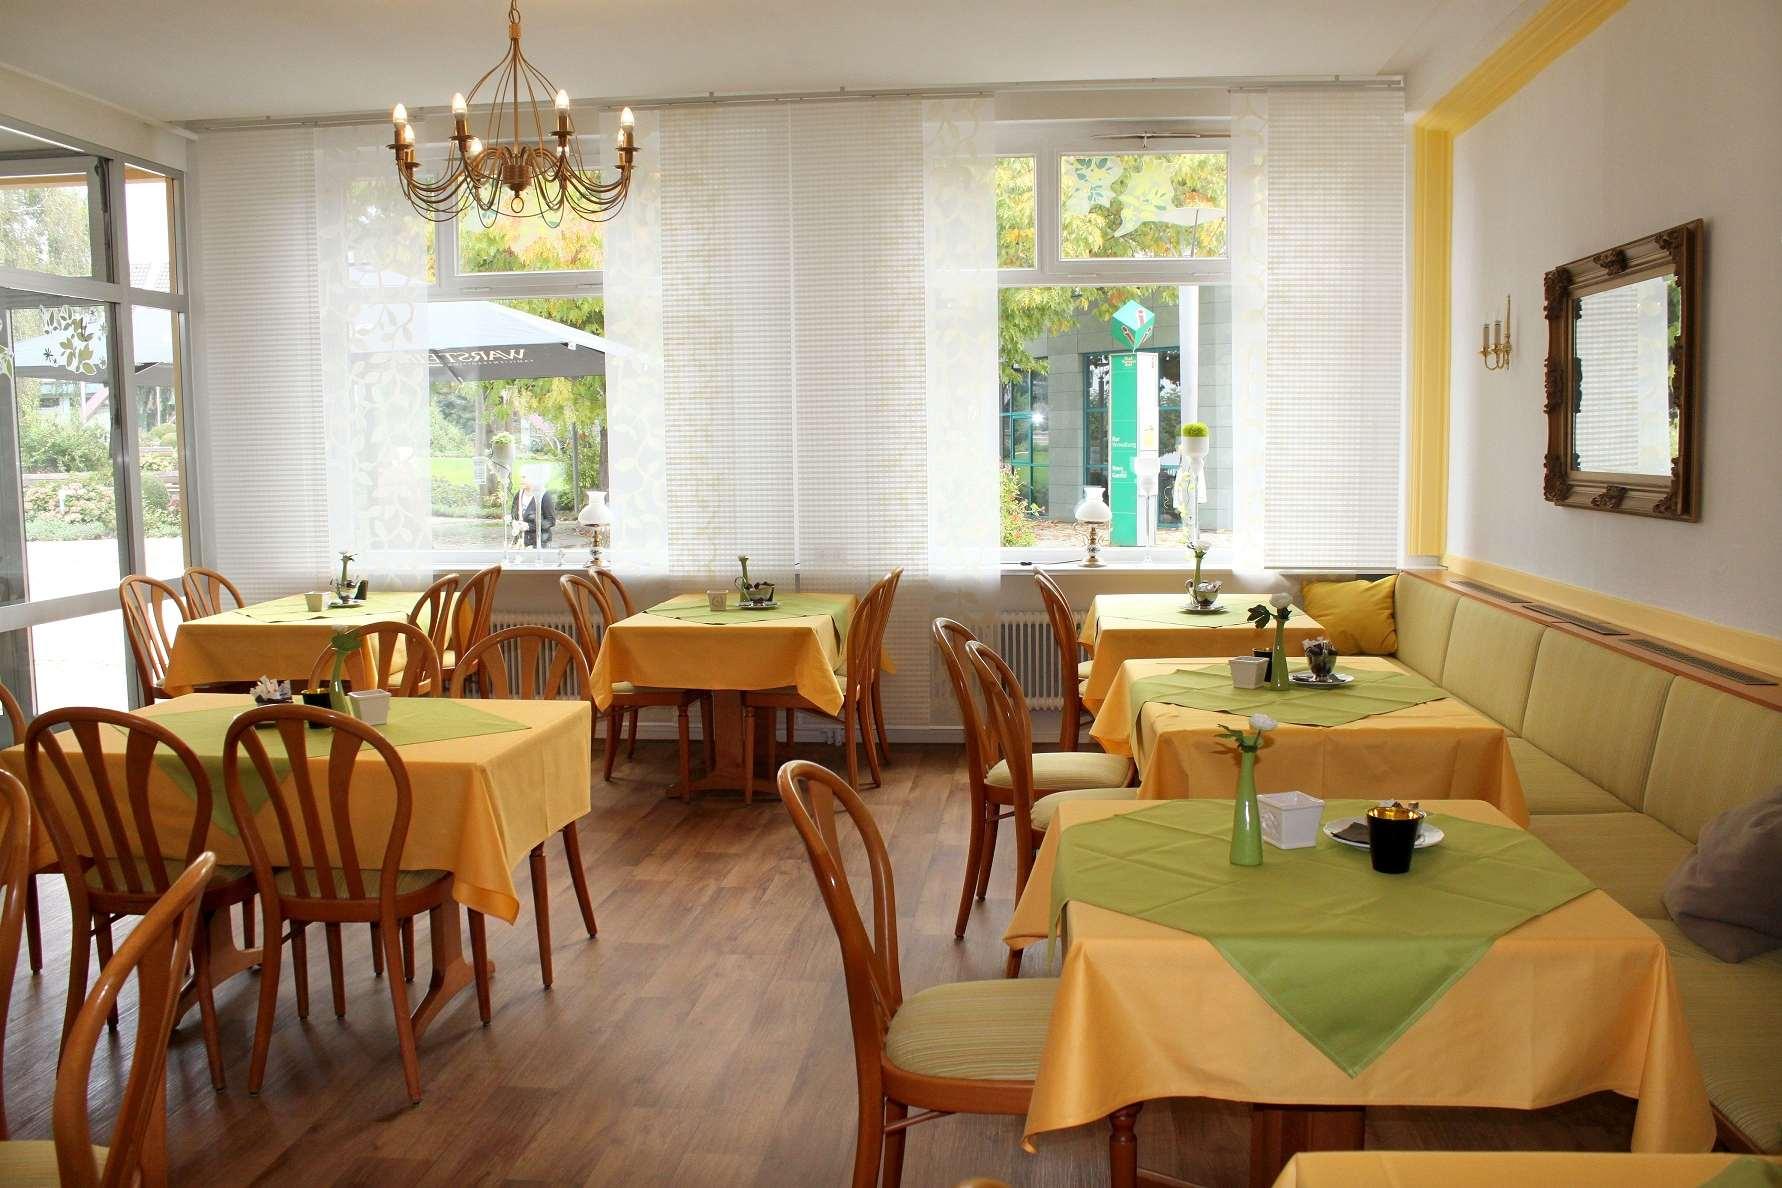 Kurcafé im Parkhotel Bad Sassendorf